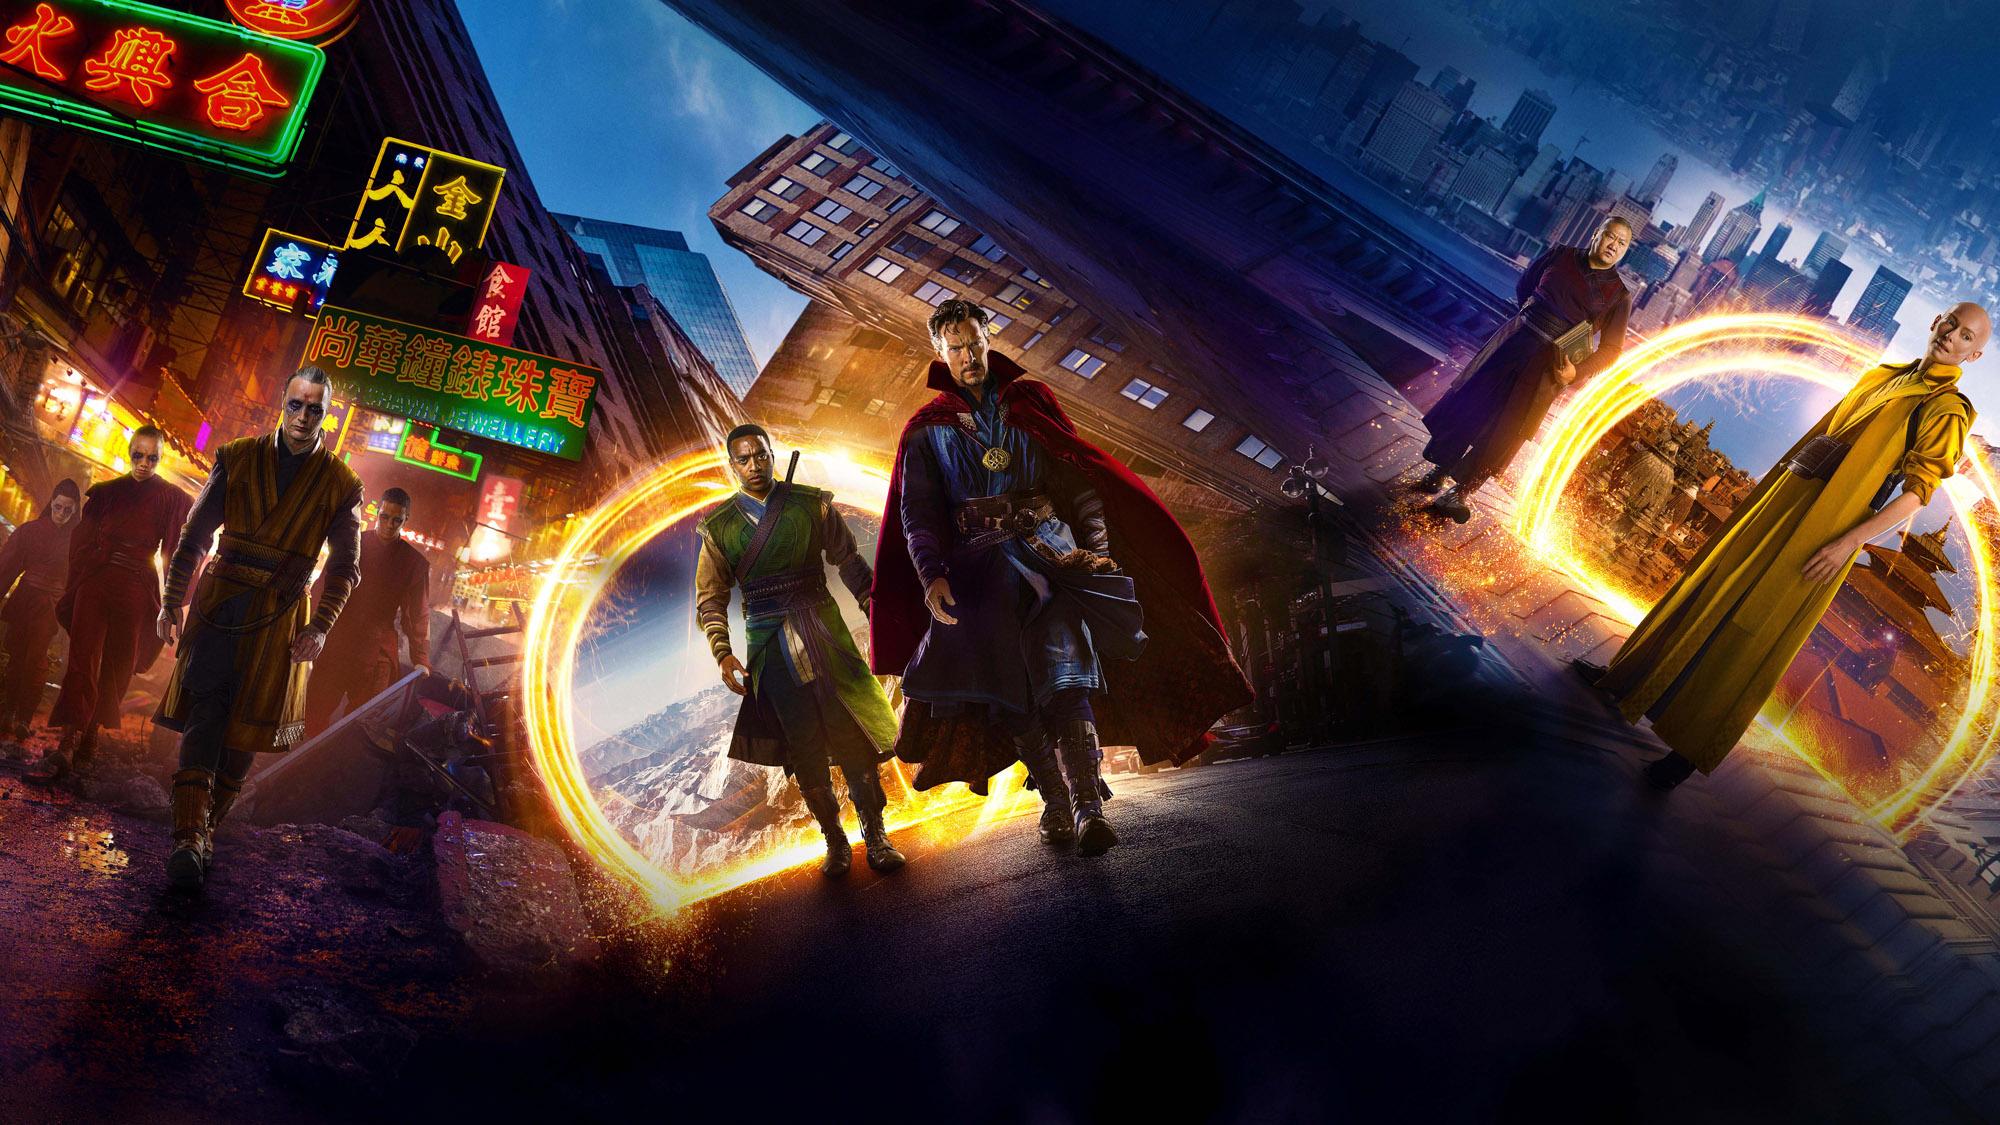 Doctor Strange Marvel Movie Wallpapers Widescreen Cinema: The 15 Best Scenes In Doctor Strange